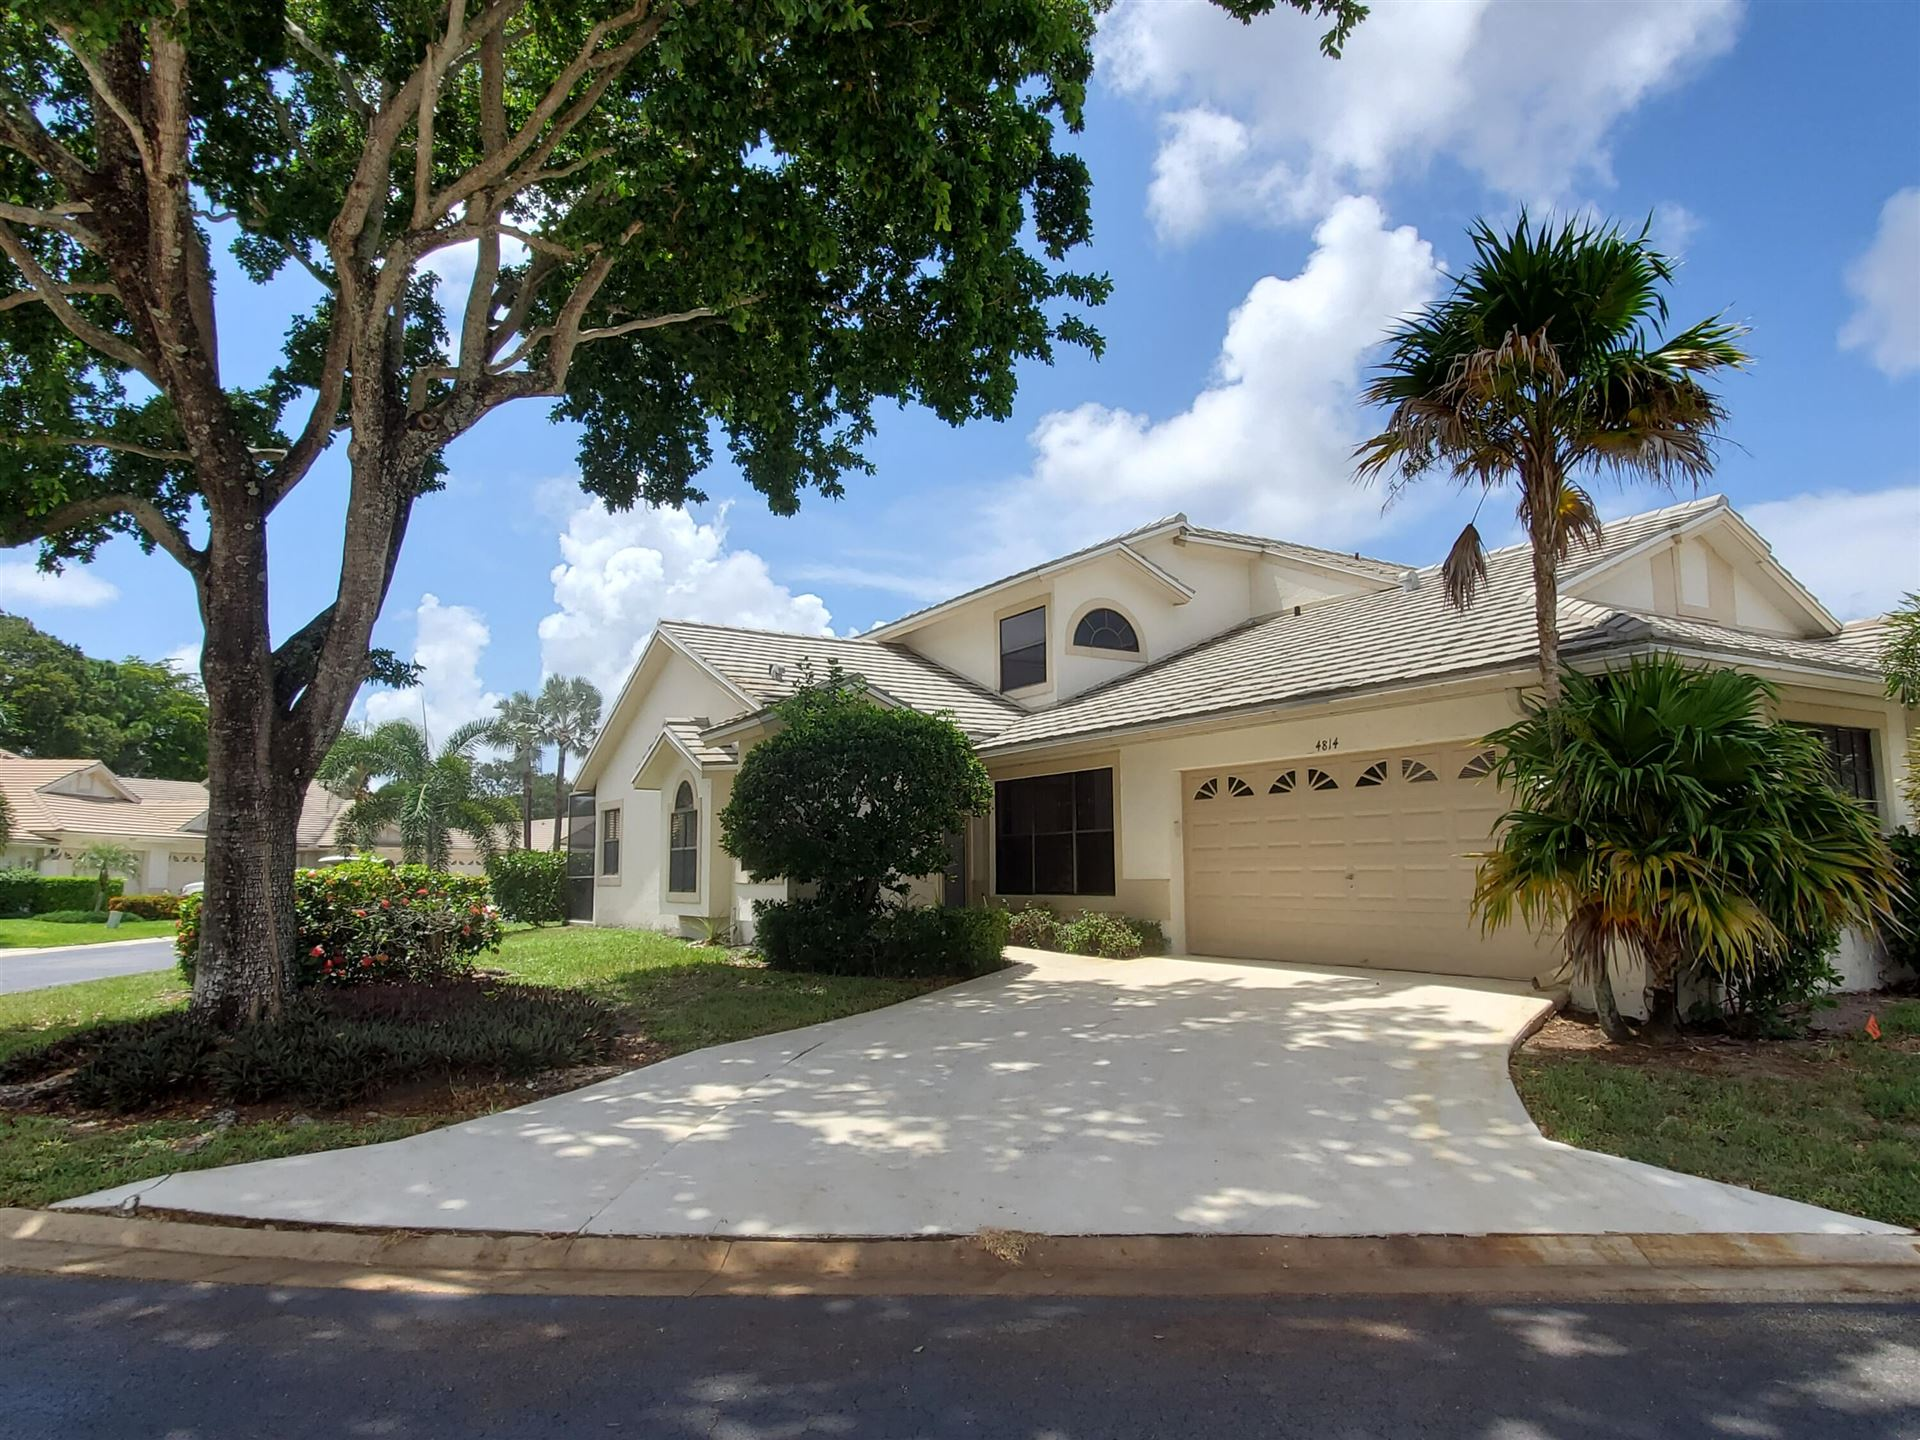 4814 Brighton Lakes Boulevard, Boynton Beach, FL 33436 - MLS#: RX-10739568